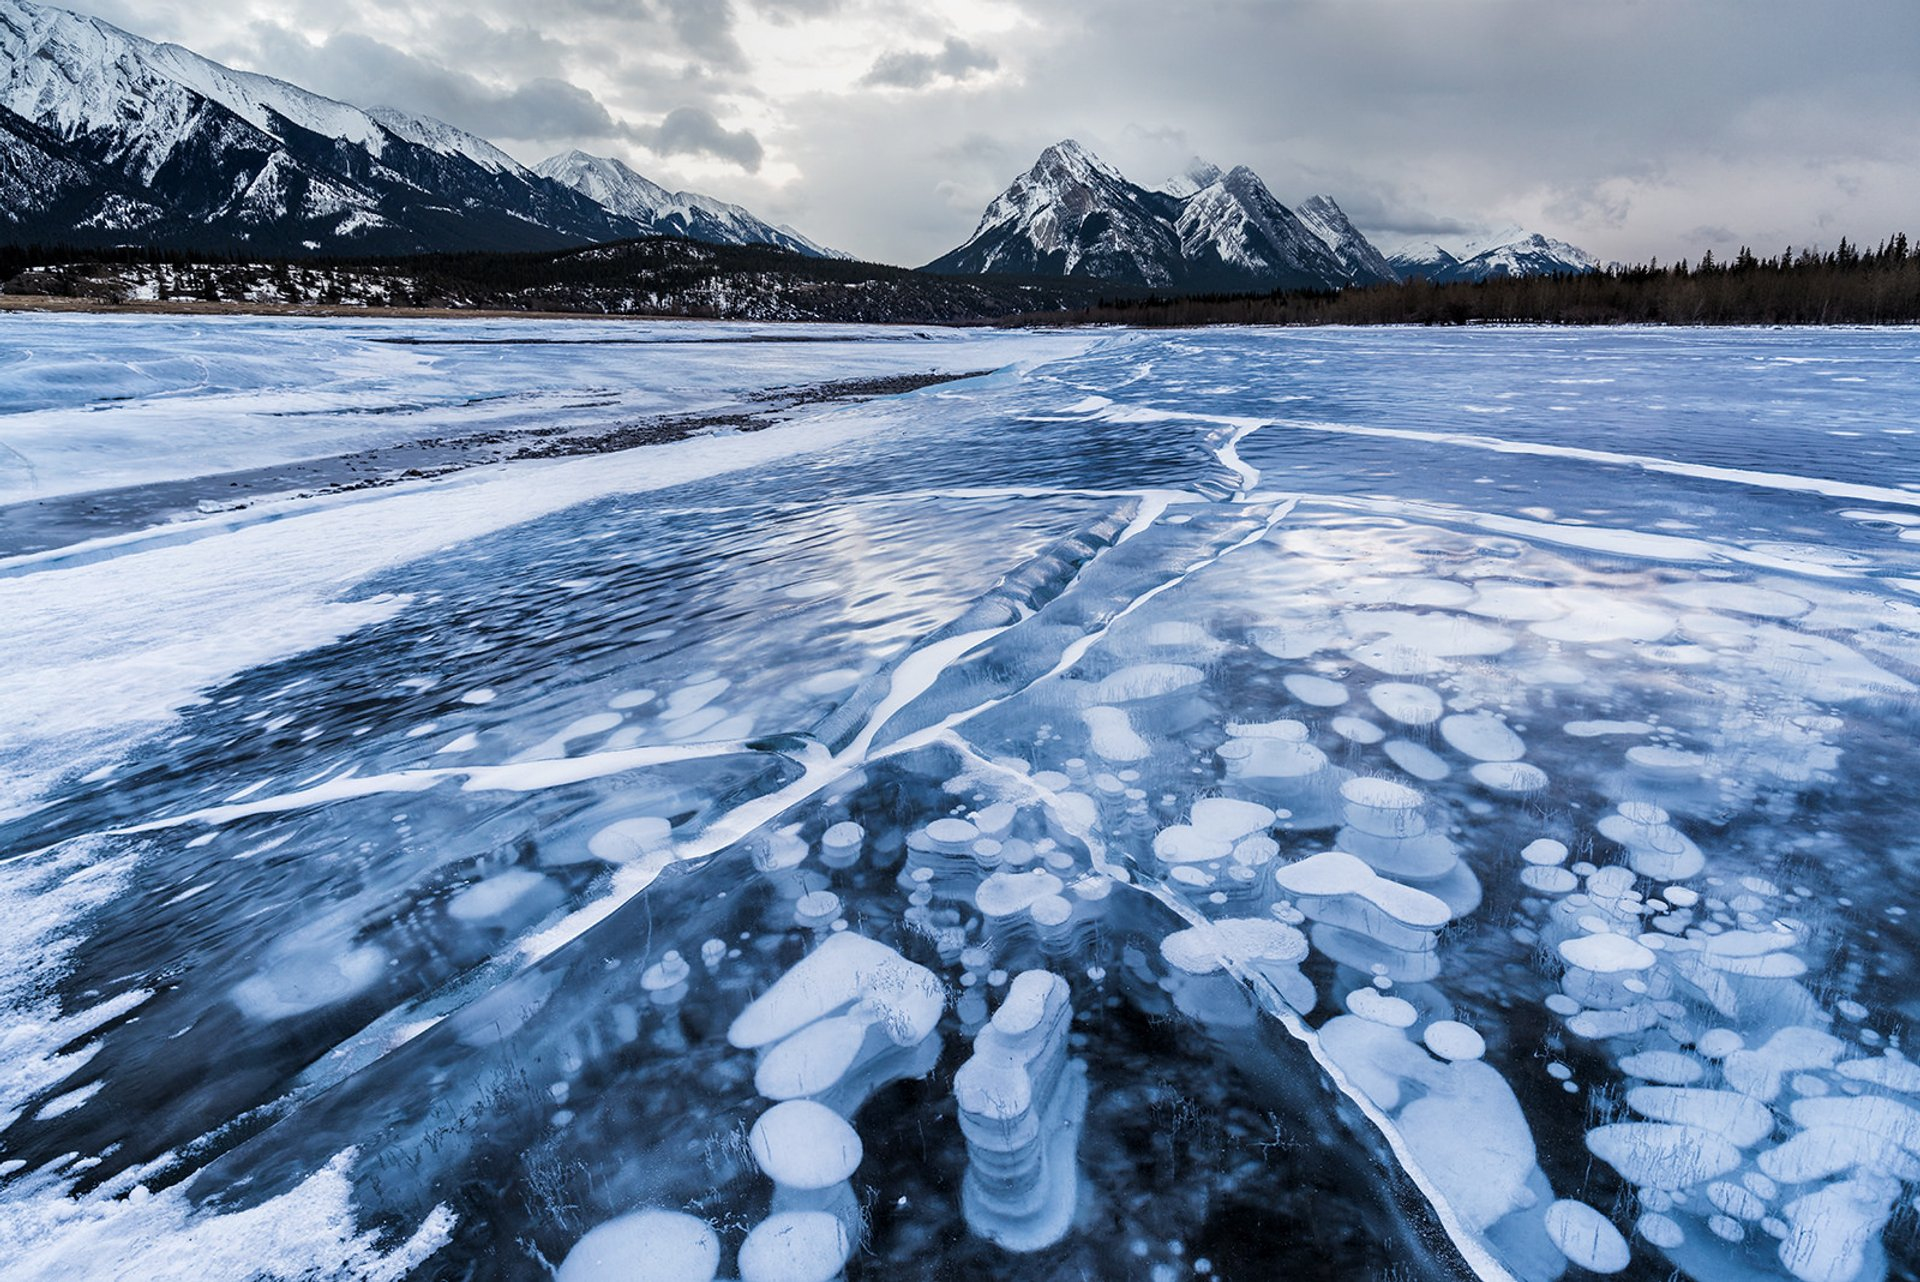 Frozen Abraham Lake in Banff & Jasper National Parks 2019 - Best Time